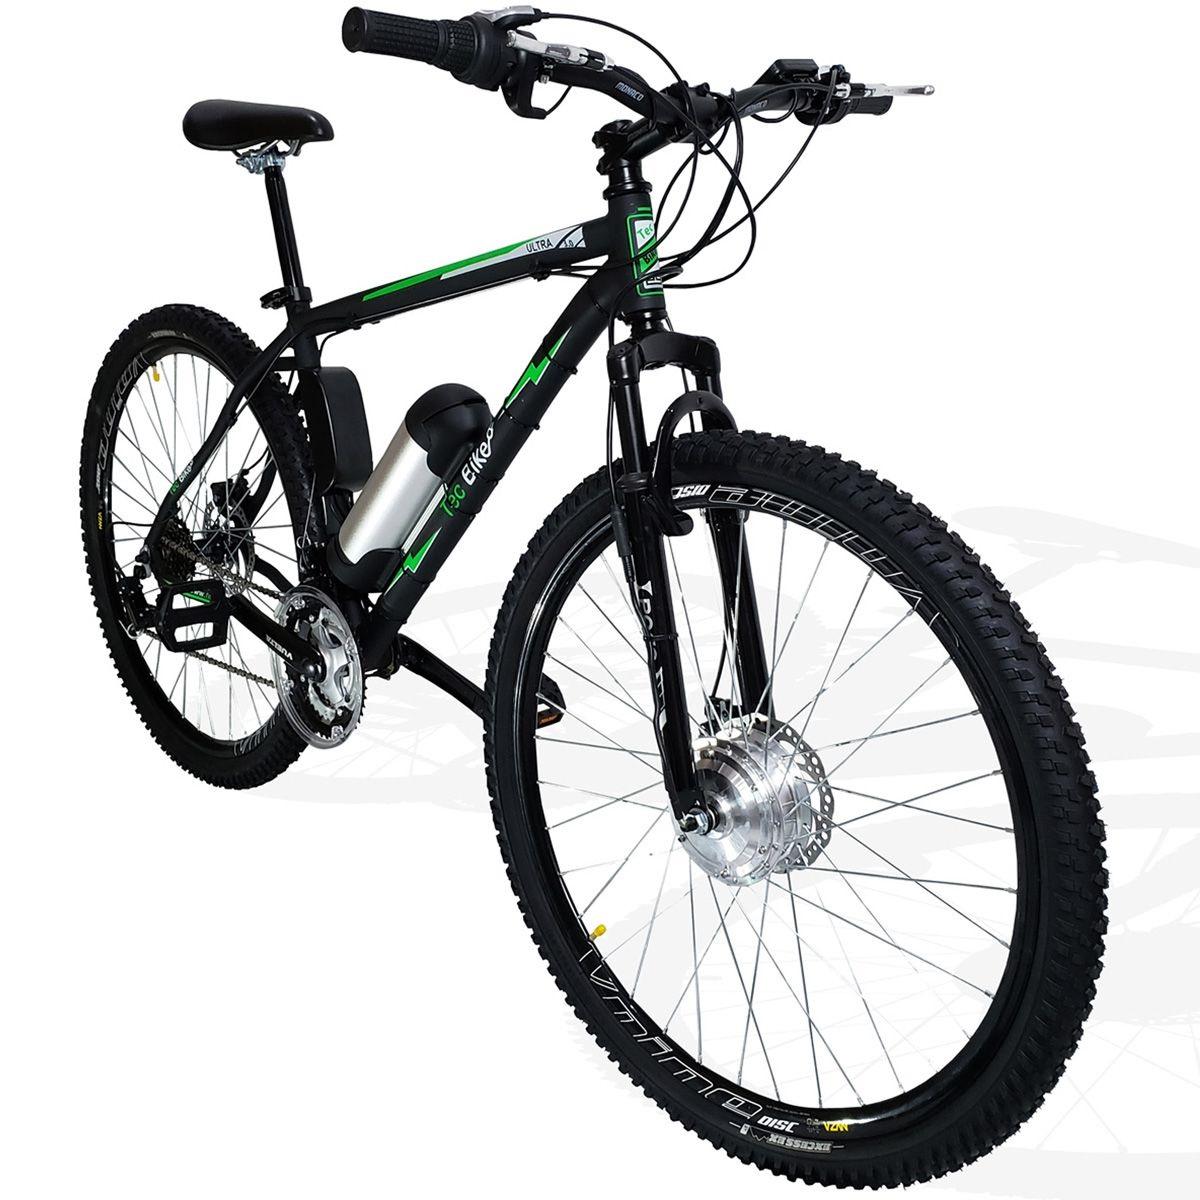 Bicicleta Elétrica Aro 29 Alumínio Bateria de LÍTIO TecUltra 3.0 - 500W